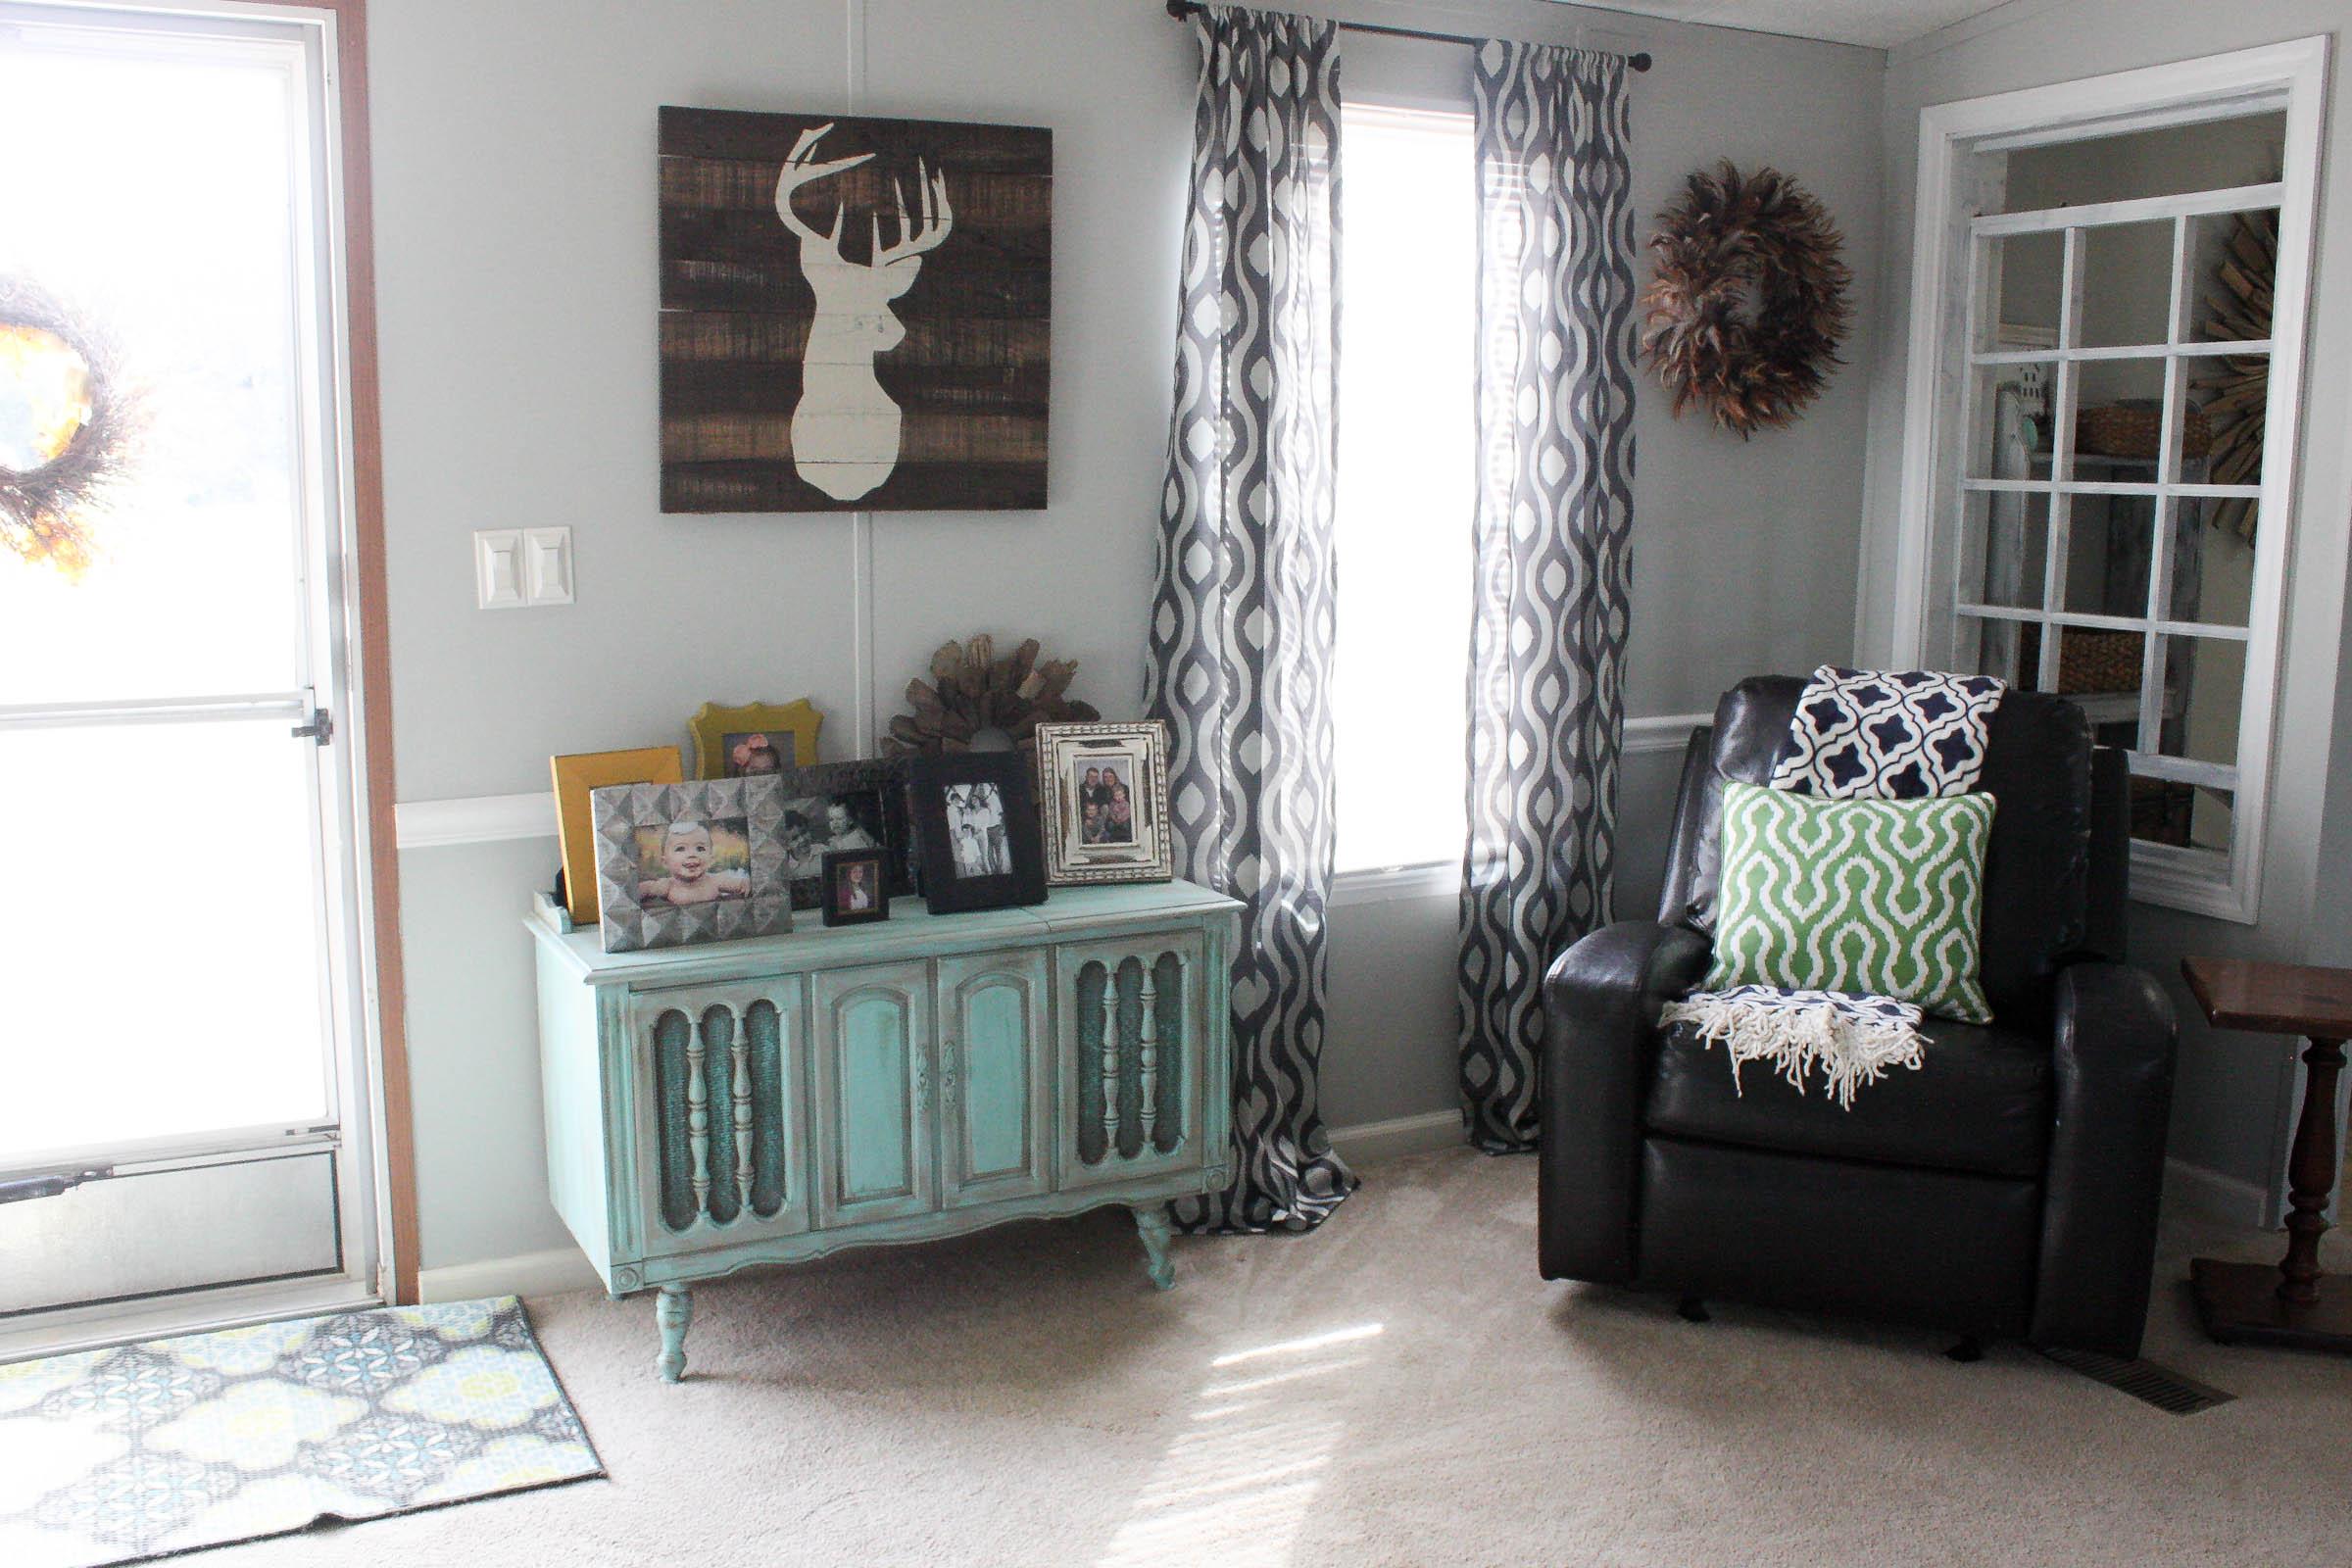 Mobile Home Living Room Reveal  ReFabbed